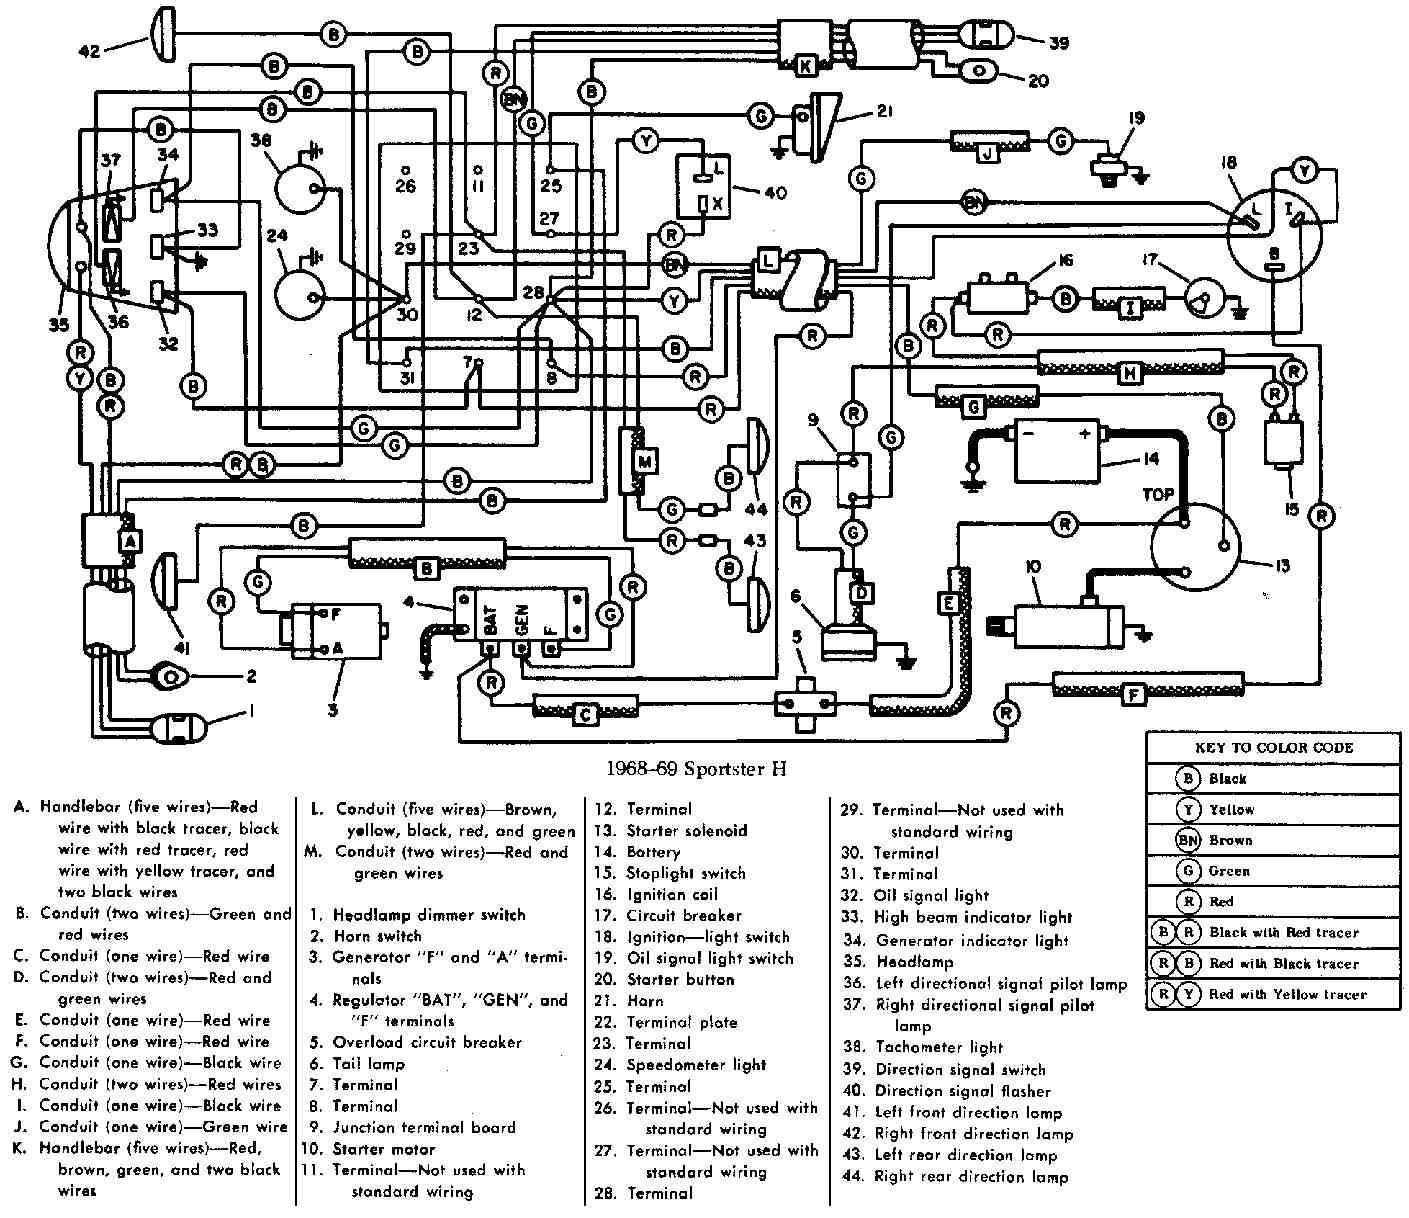 medium resolution of 94 harley softail wiring diagram wiring diagram blog 1991 fatboy diagram of ignition switch